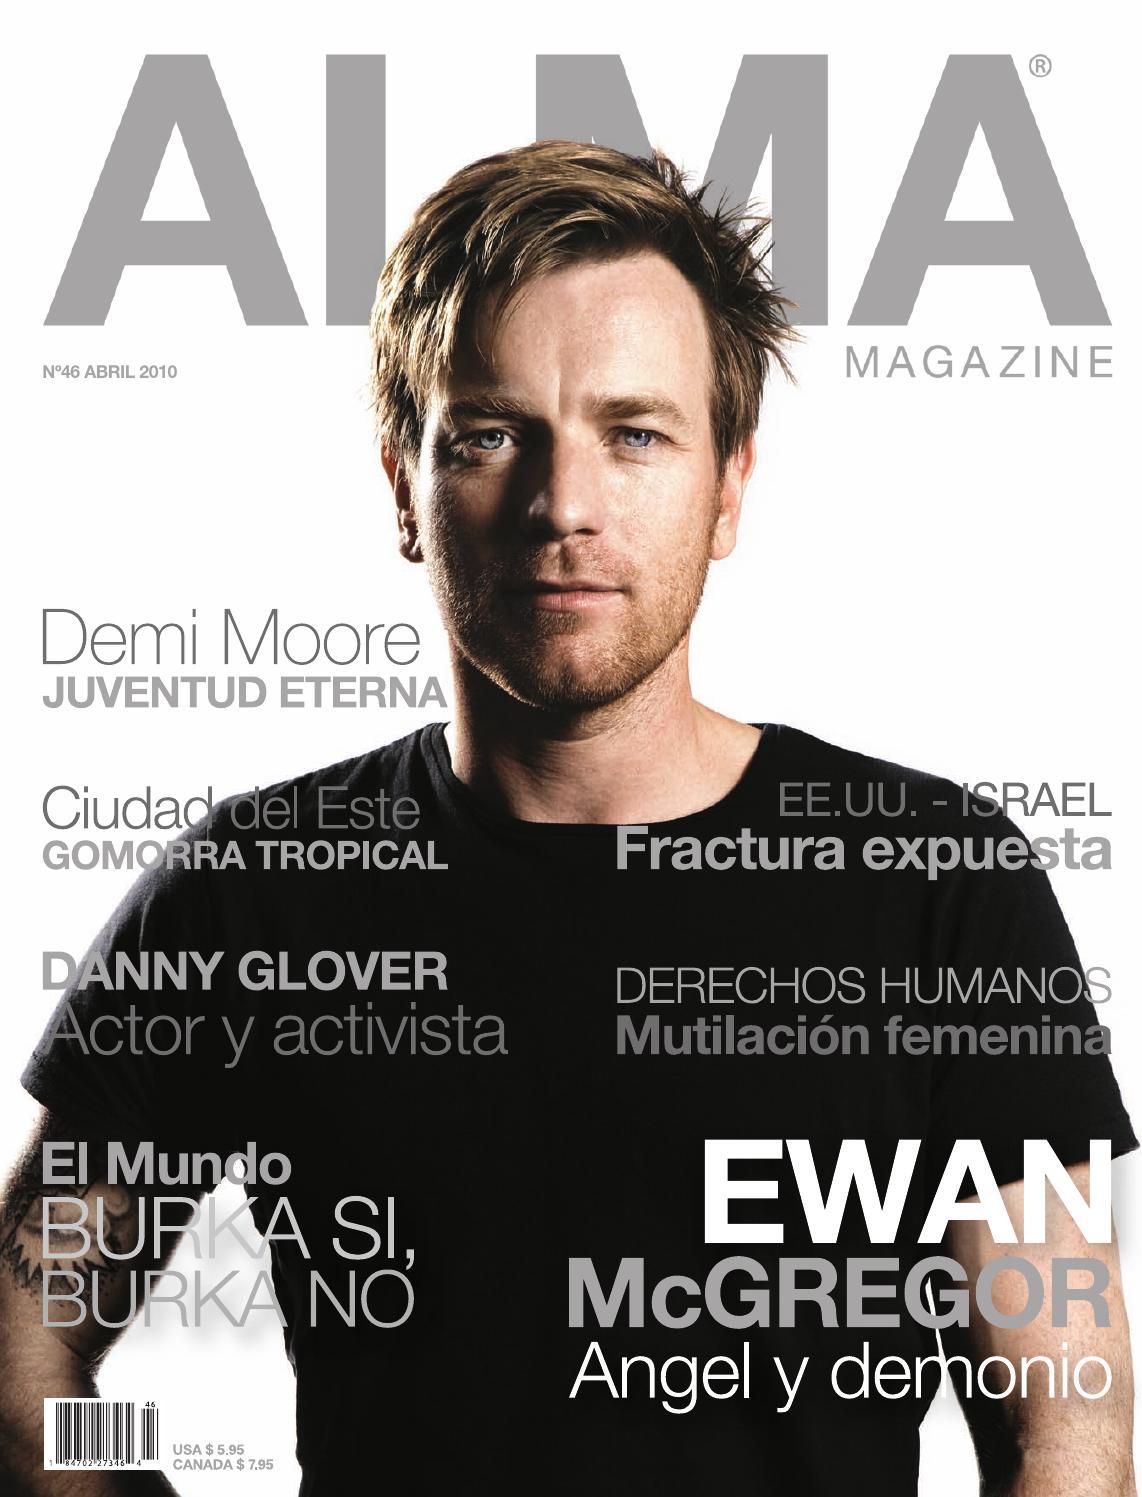 ALMA MAGAZINE 46 - ABRIL 2010 by ALMA MAGAZINE - issuu